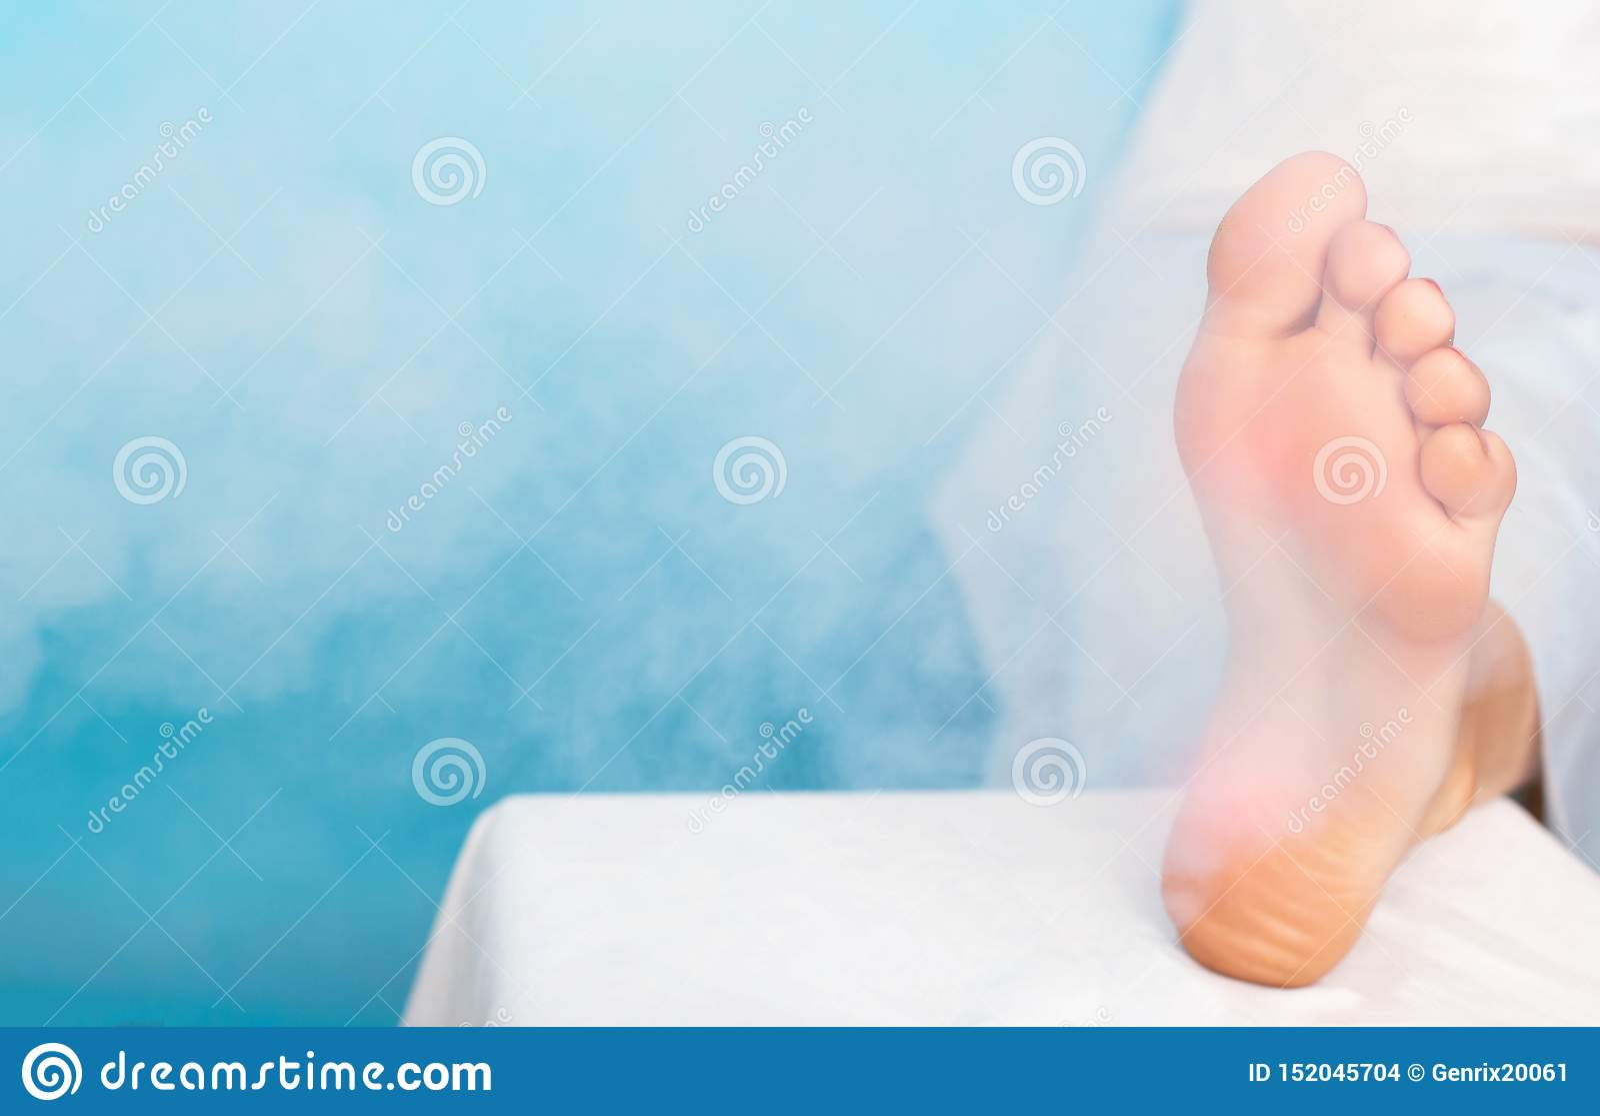 warts treatment dermatologist